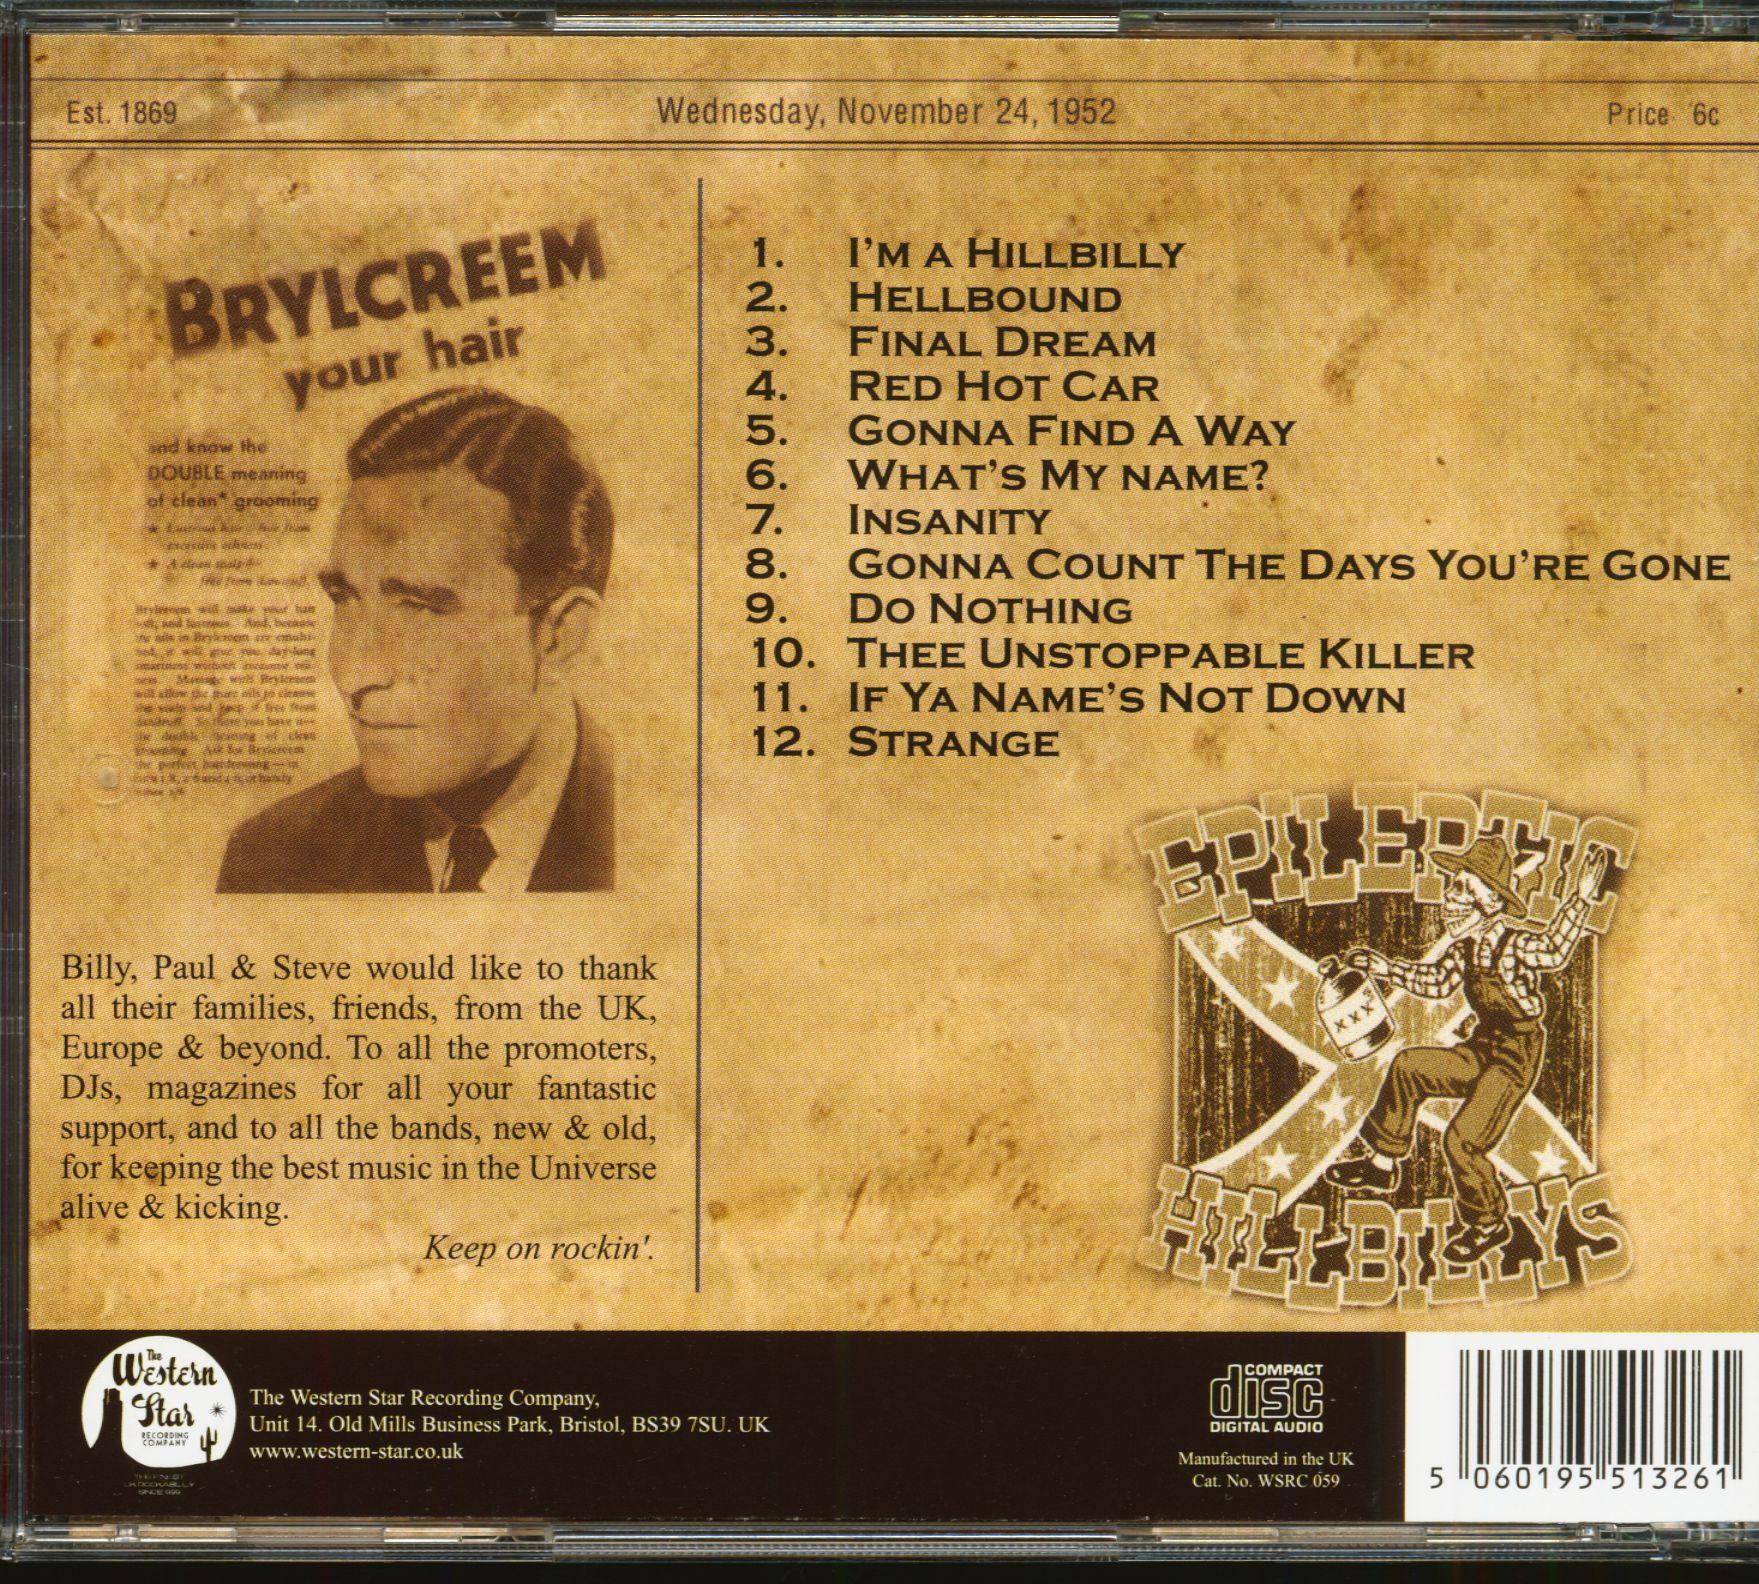 The Epileptic Hillbilly's Insanity (CD)